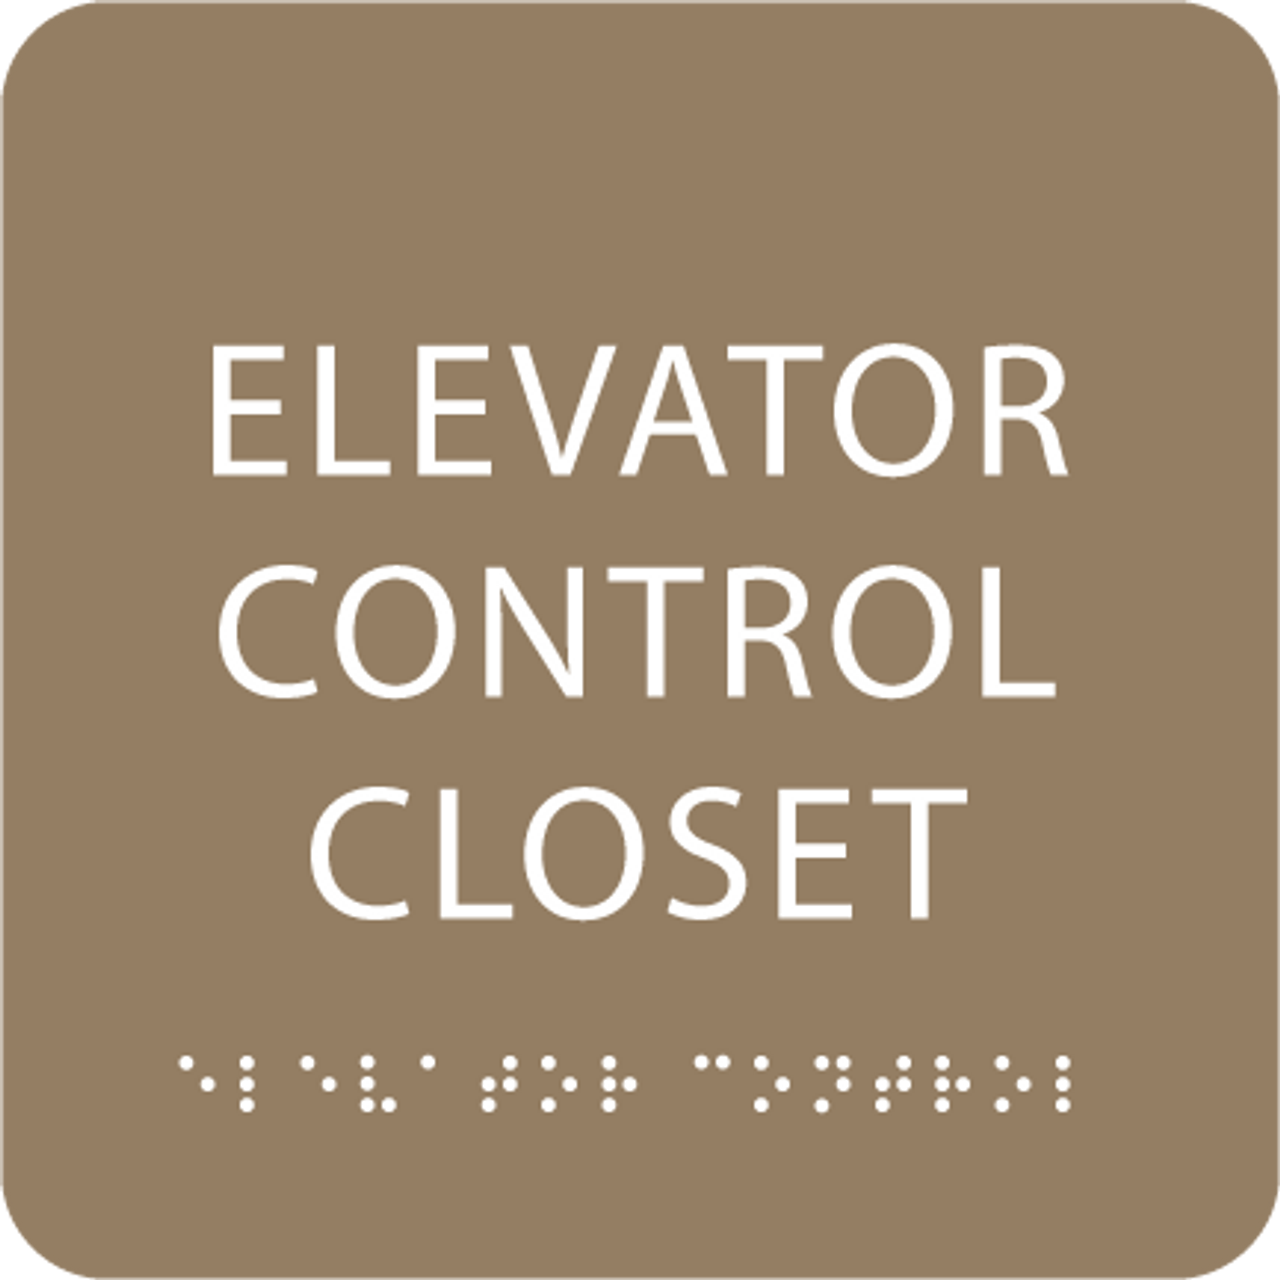 Brown Elevator Control Closet Braille Sign